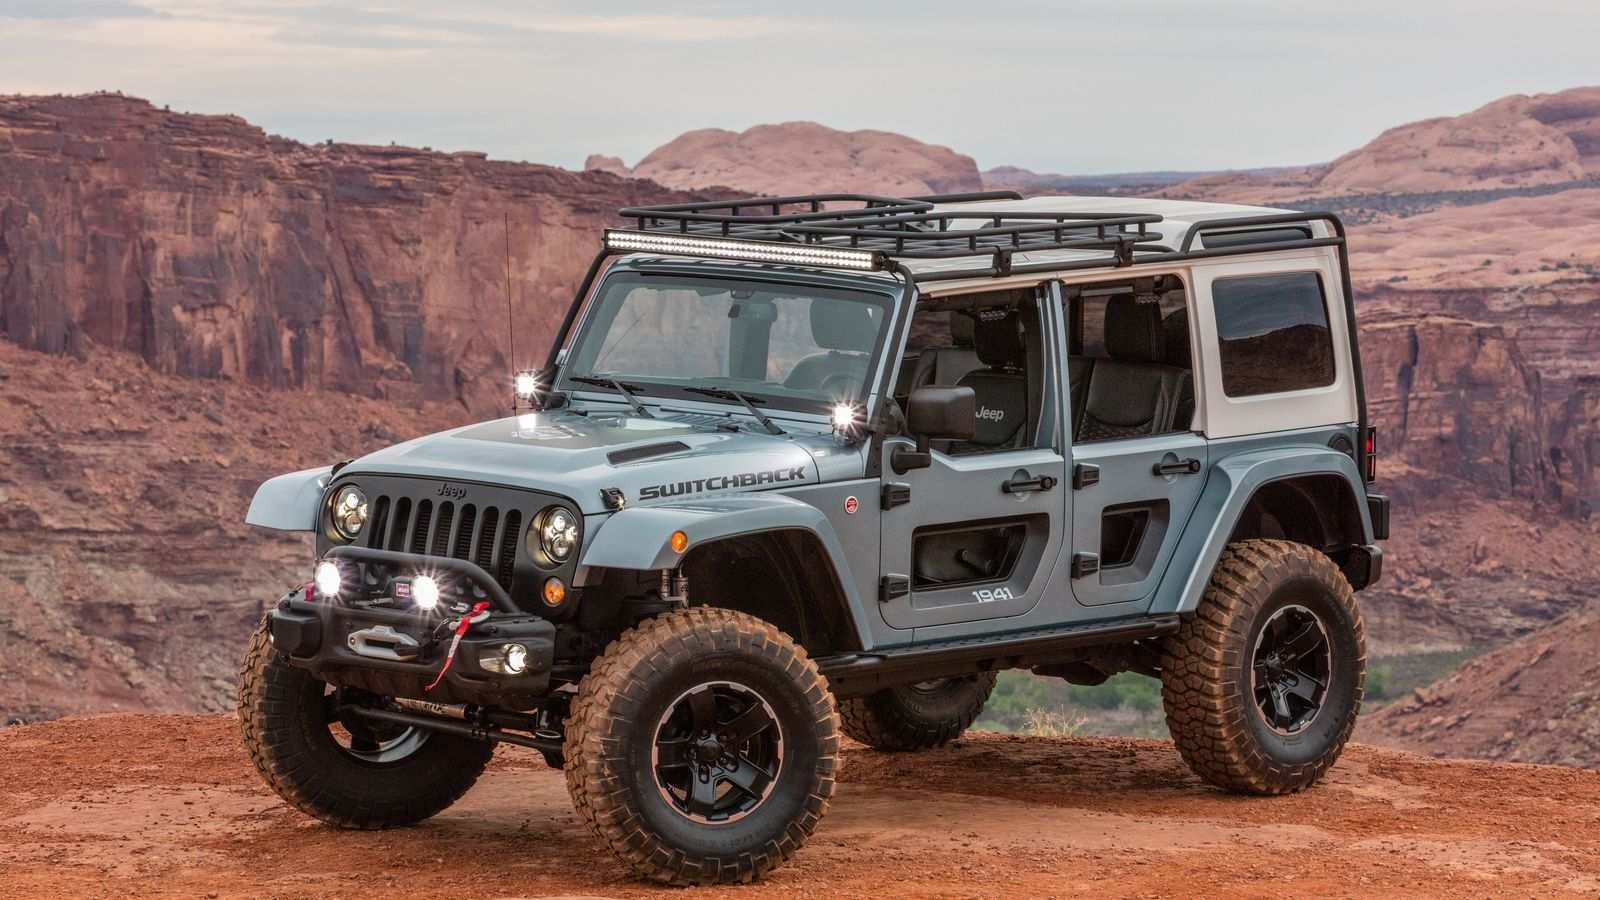 25 Concept of 2019 Jeep Wrangler La Auto Show Photos by 2019 Jeep Wrangler La Auto Show